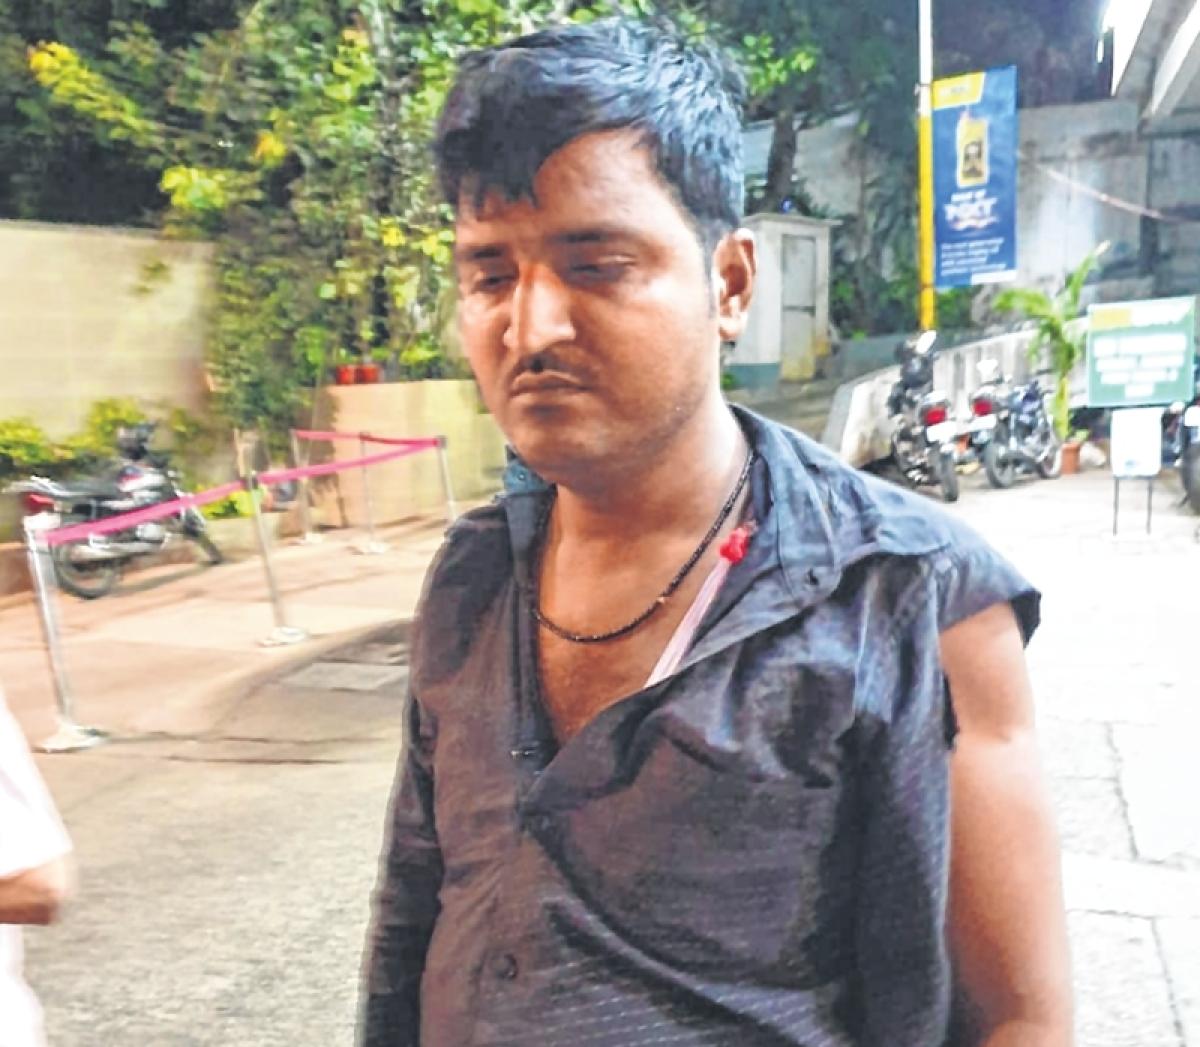 Elderly woman, nephew thrashed in South Mumbai for feeding stray cats